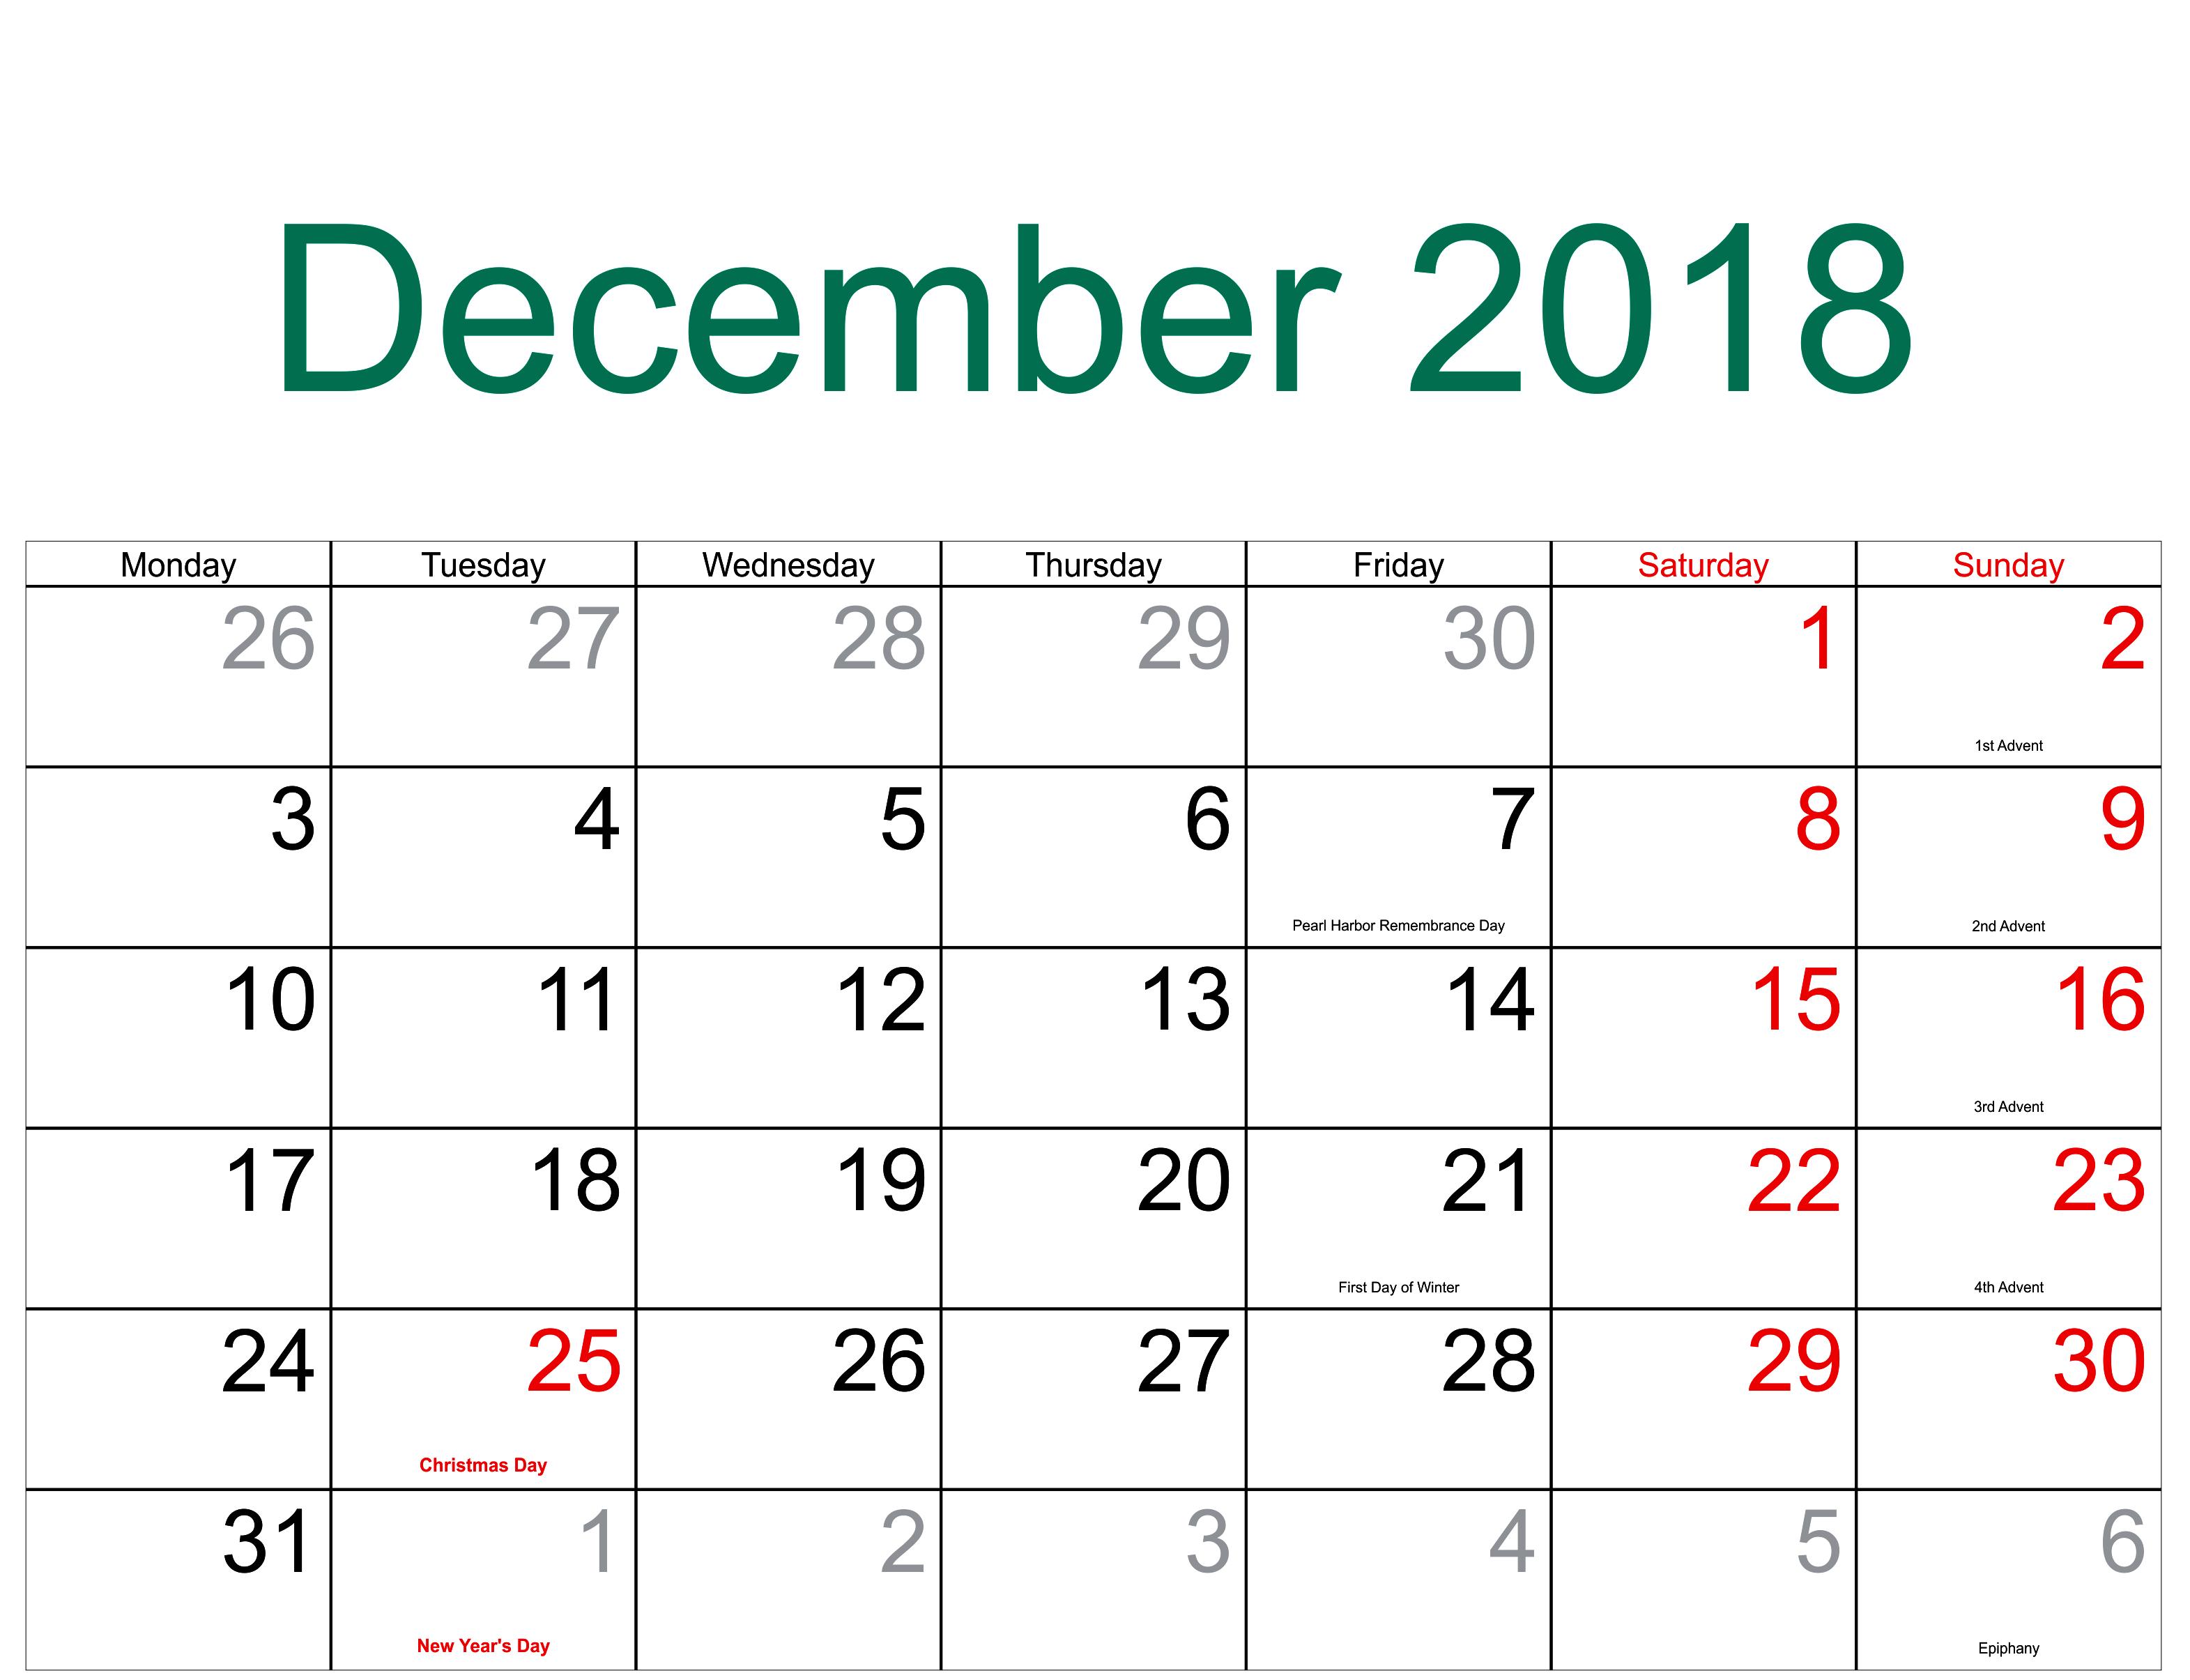 December Calendar 2018 With Holidays   December 2018 Calendar   July for Holidays Calendar Templates November